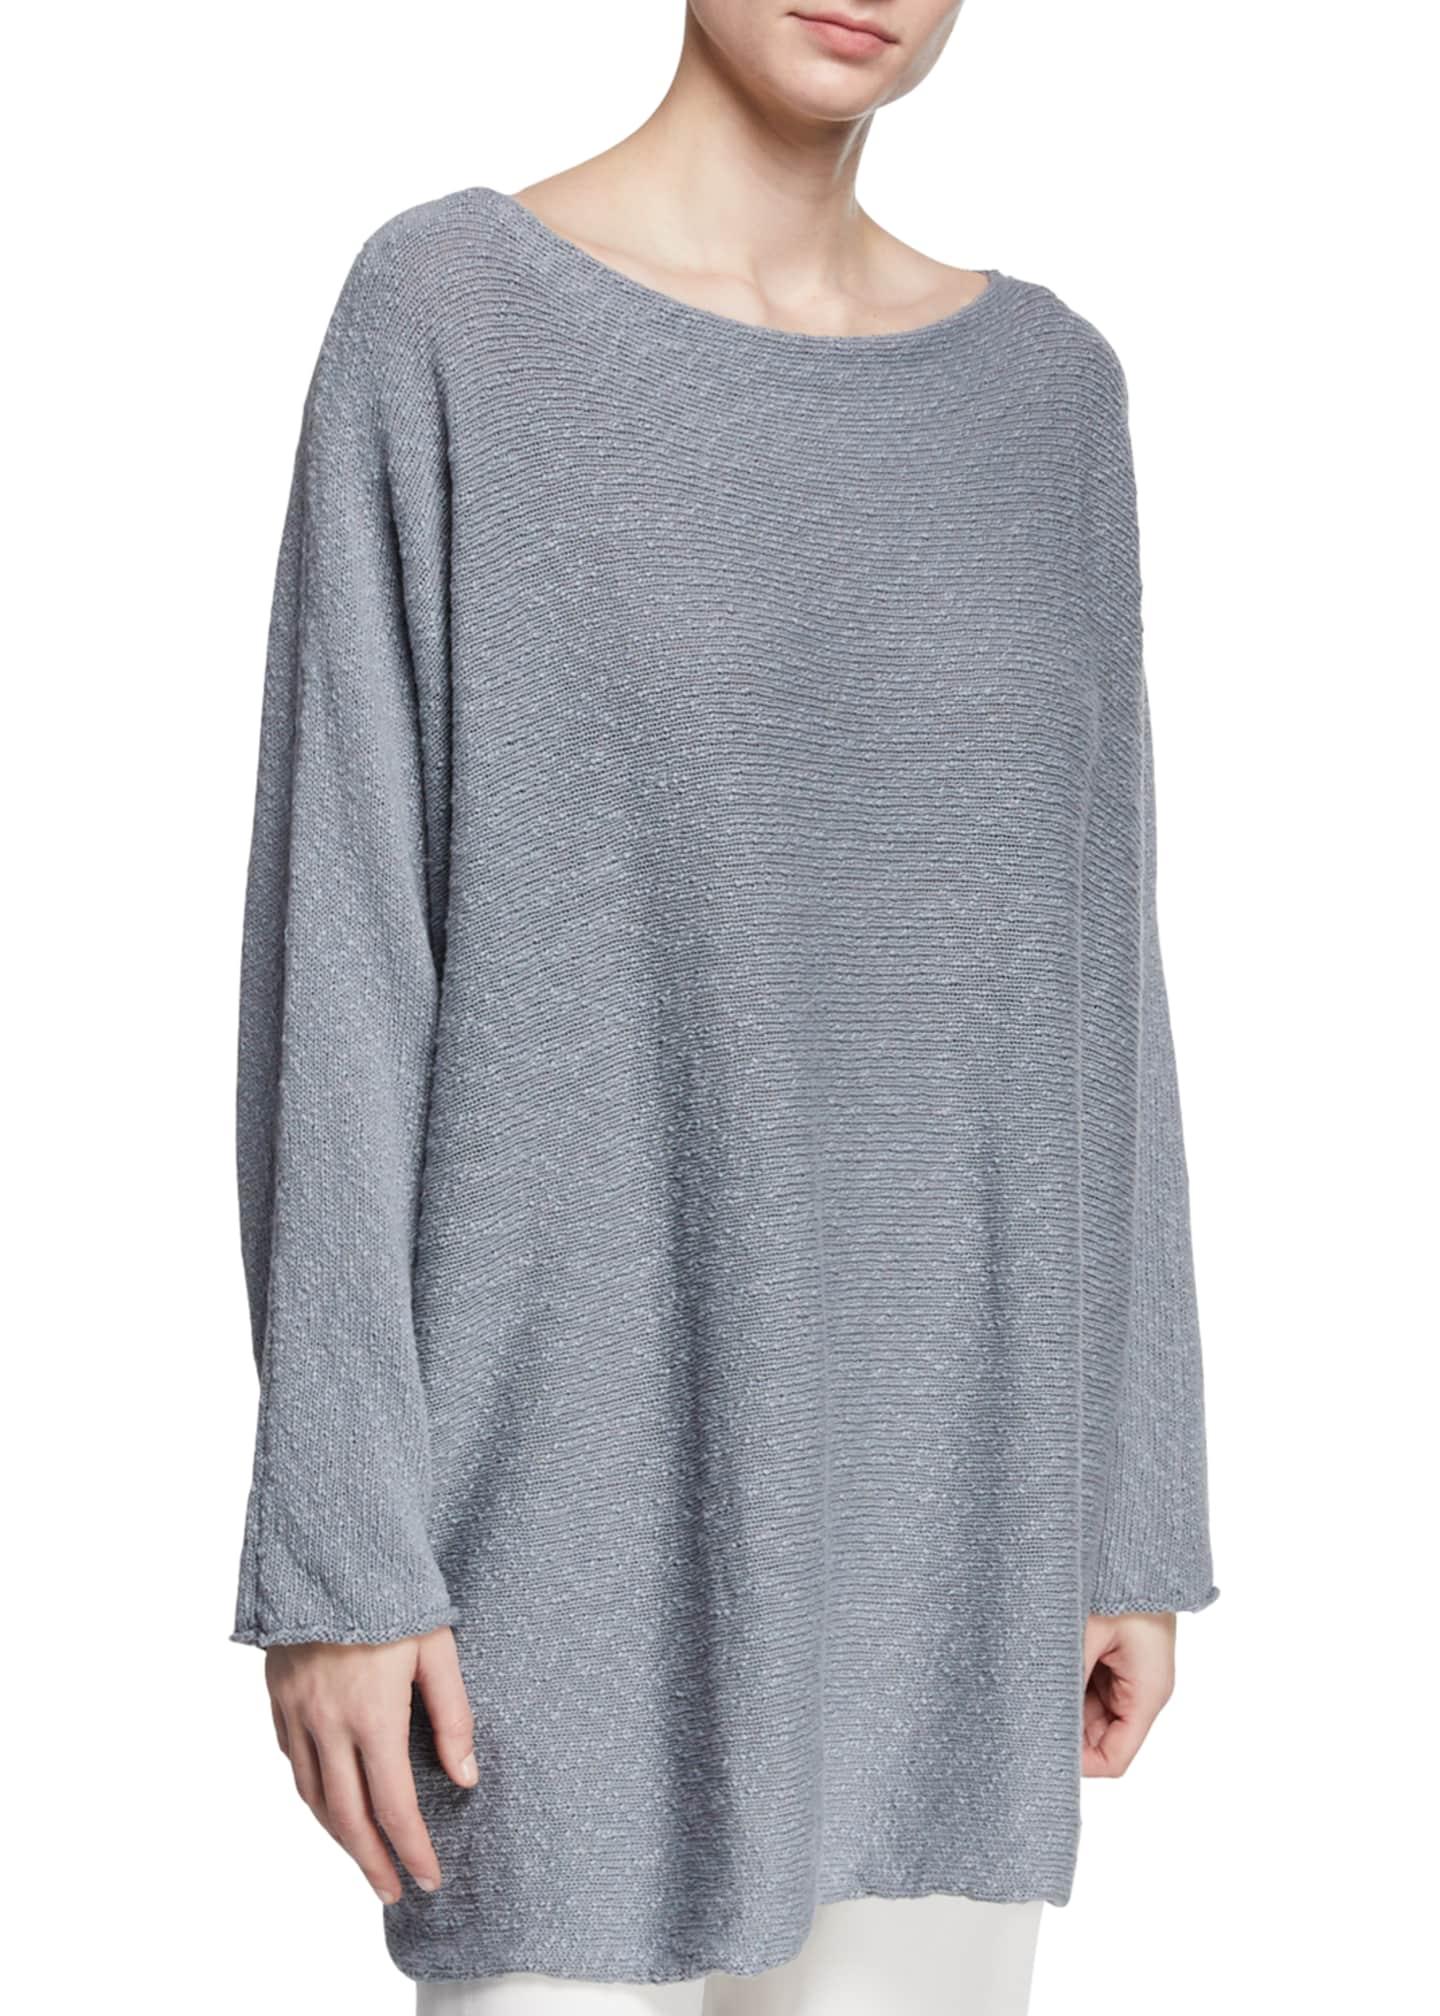 Eskandar Slim-Sleeve Sideways Knitted Sweater